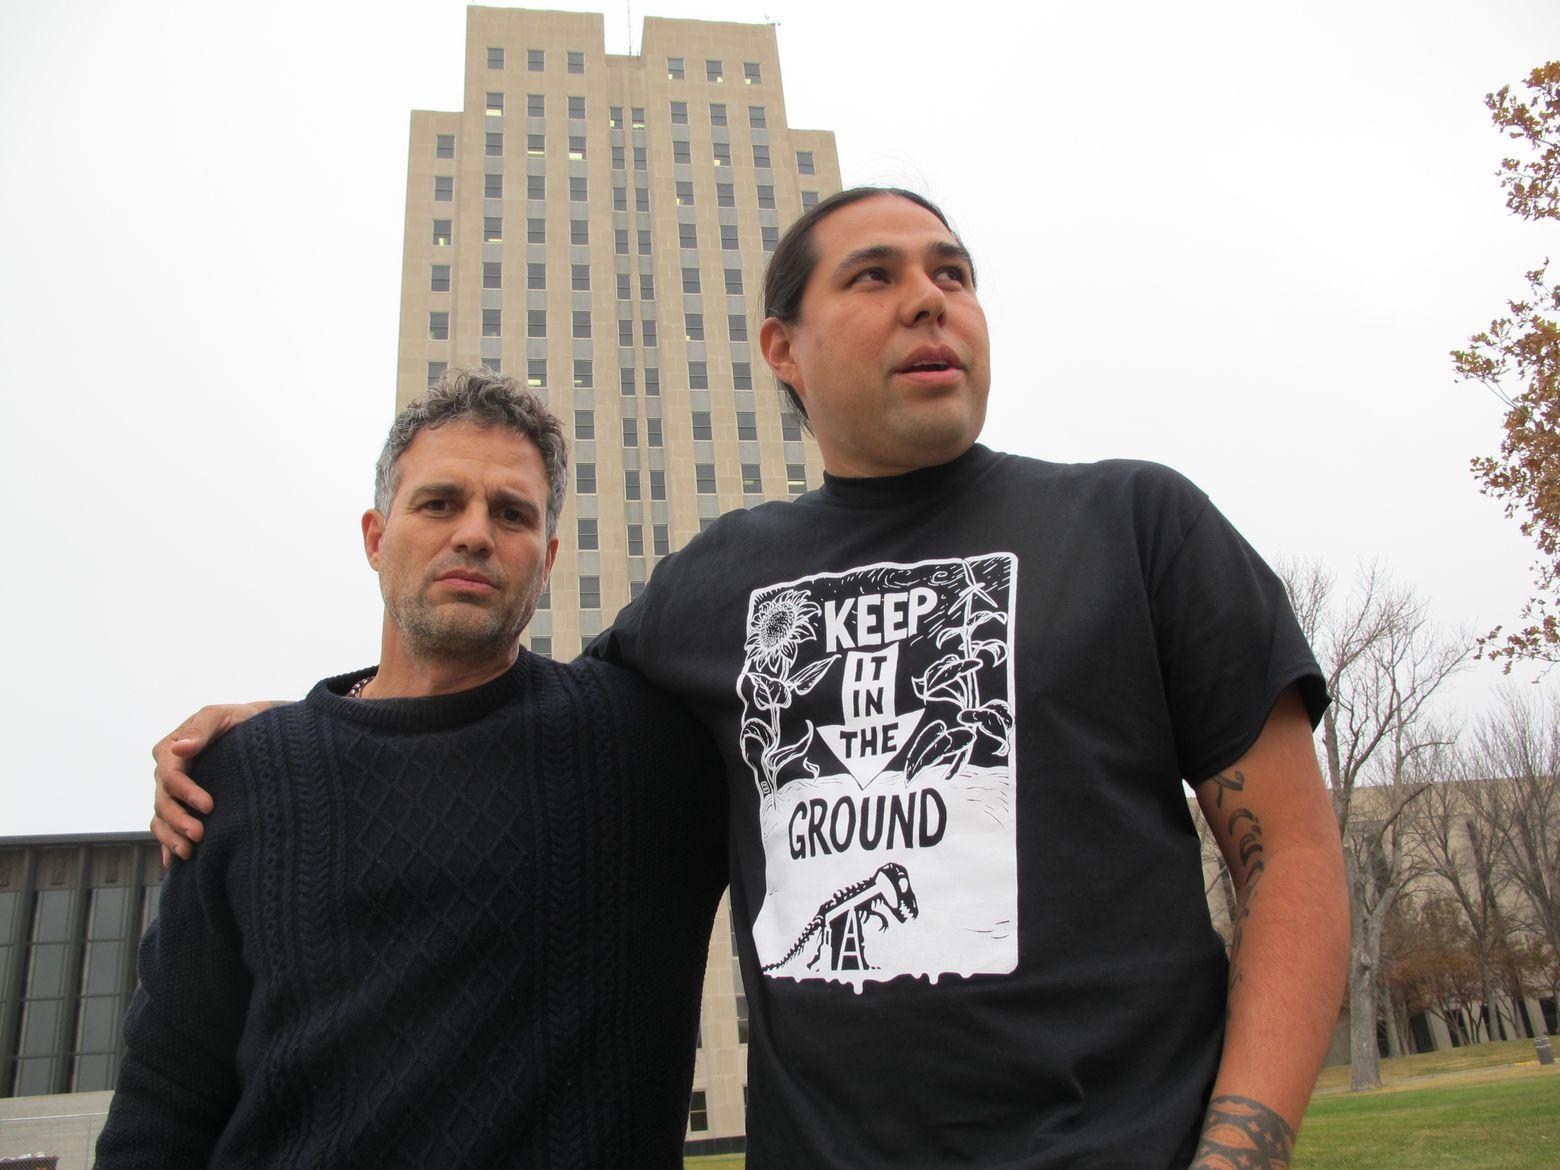 Actor Mark Ruffalo in North Dakota to oppose oil pipeline